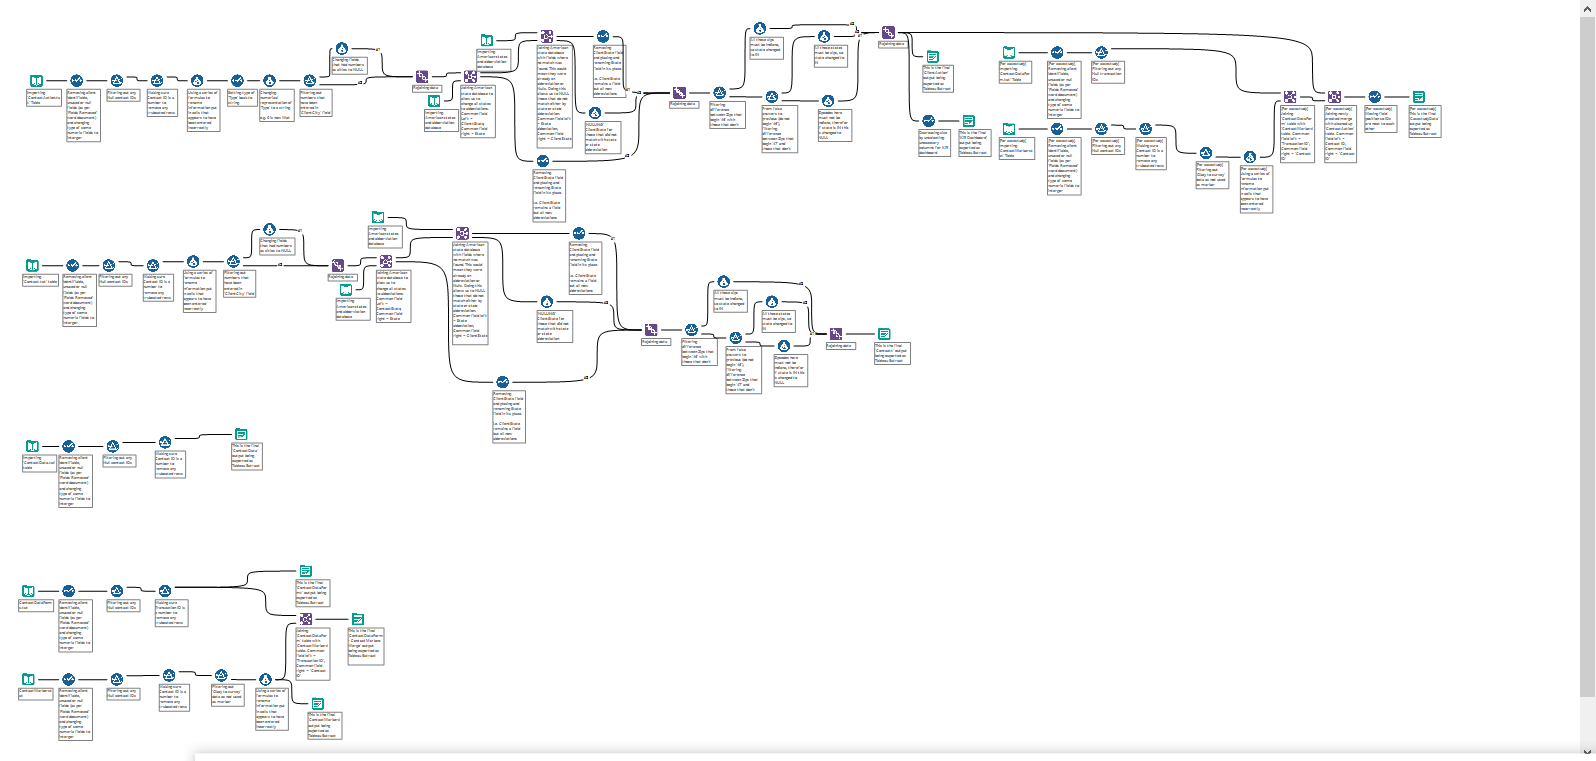 Alteryx Workflow